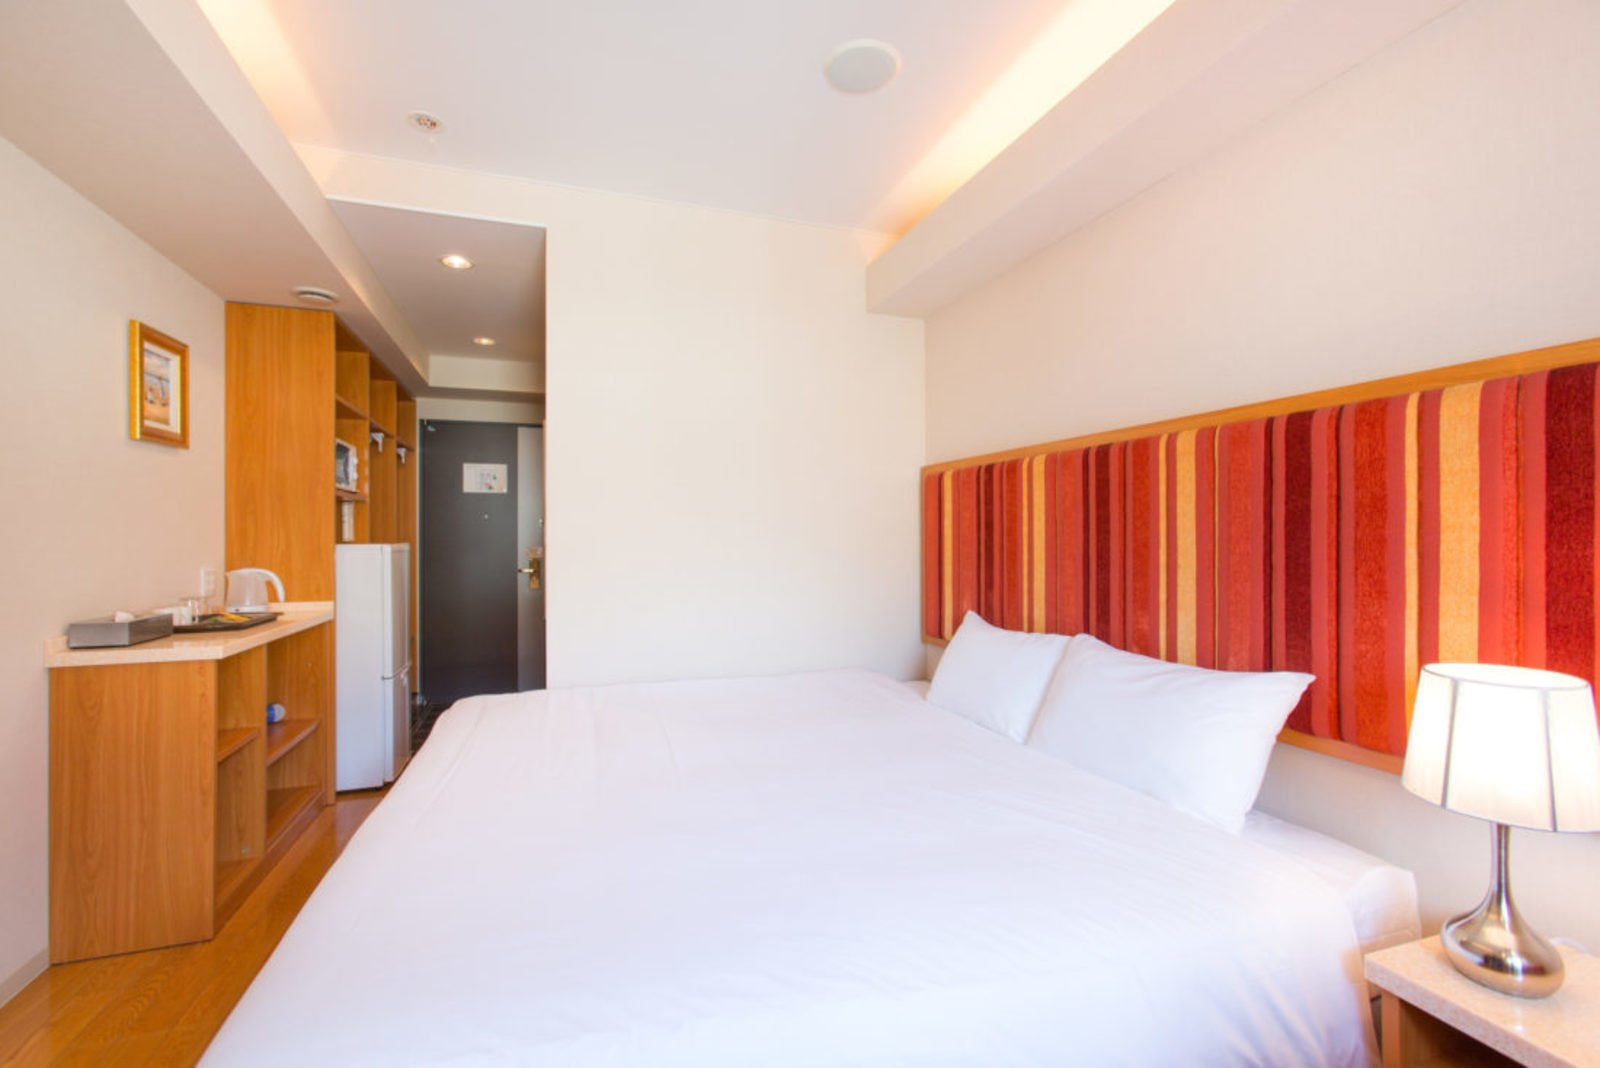 M hotel standard room 2 large